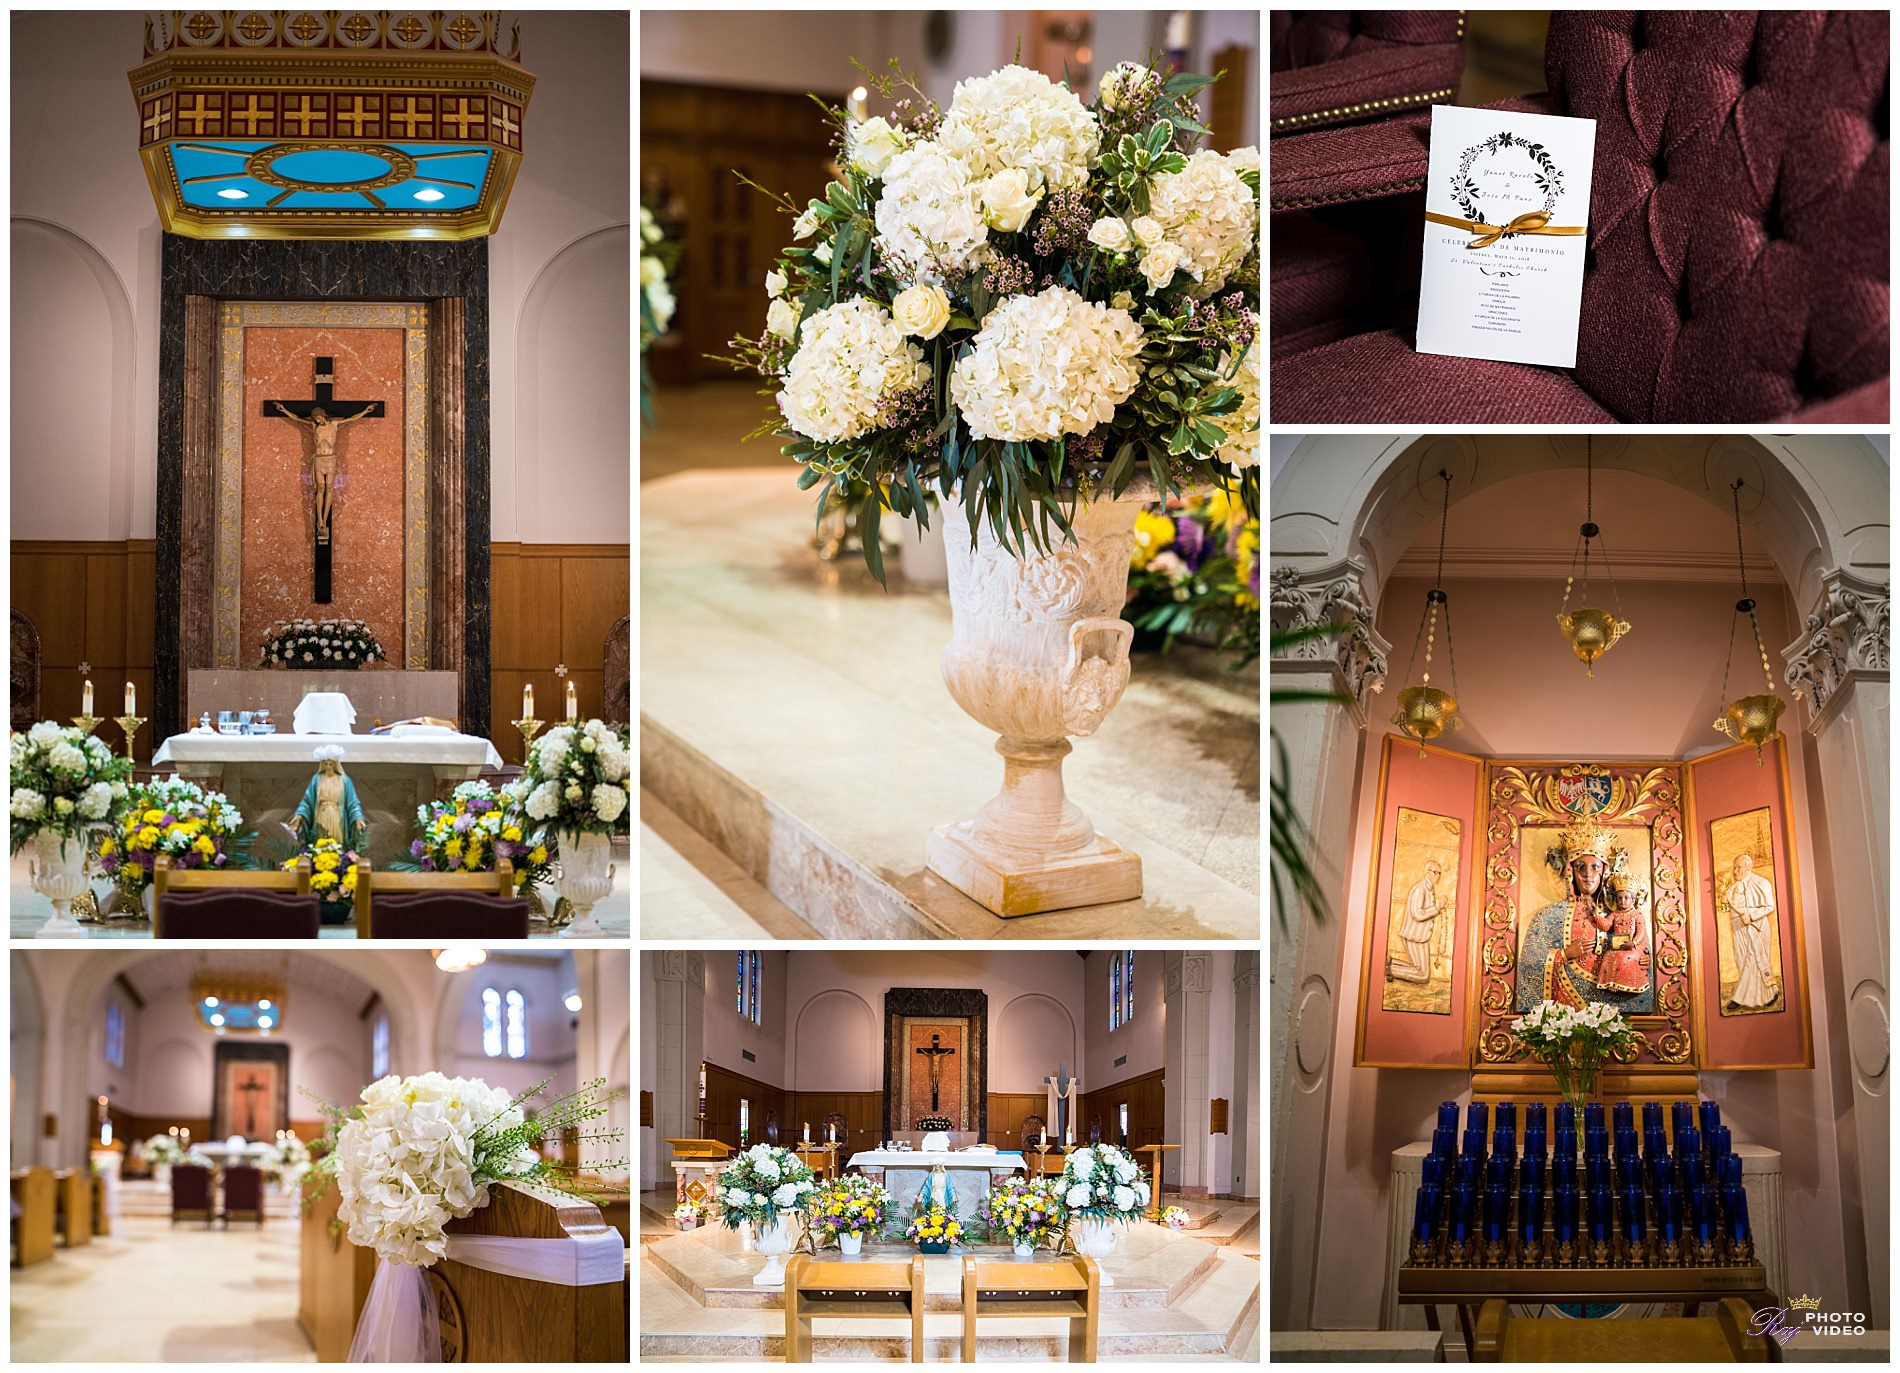 St-Valentines-Catholic-Church-Bloomfield-NJ-Wedding-Yanet-Jose-1.jpg